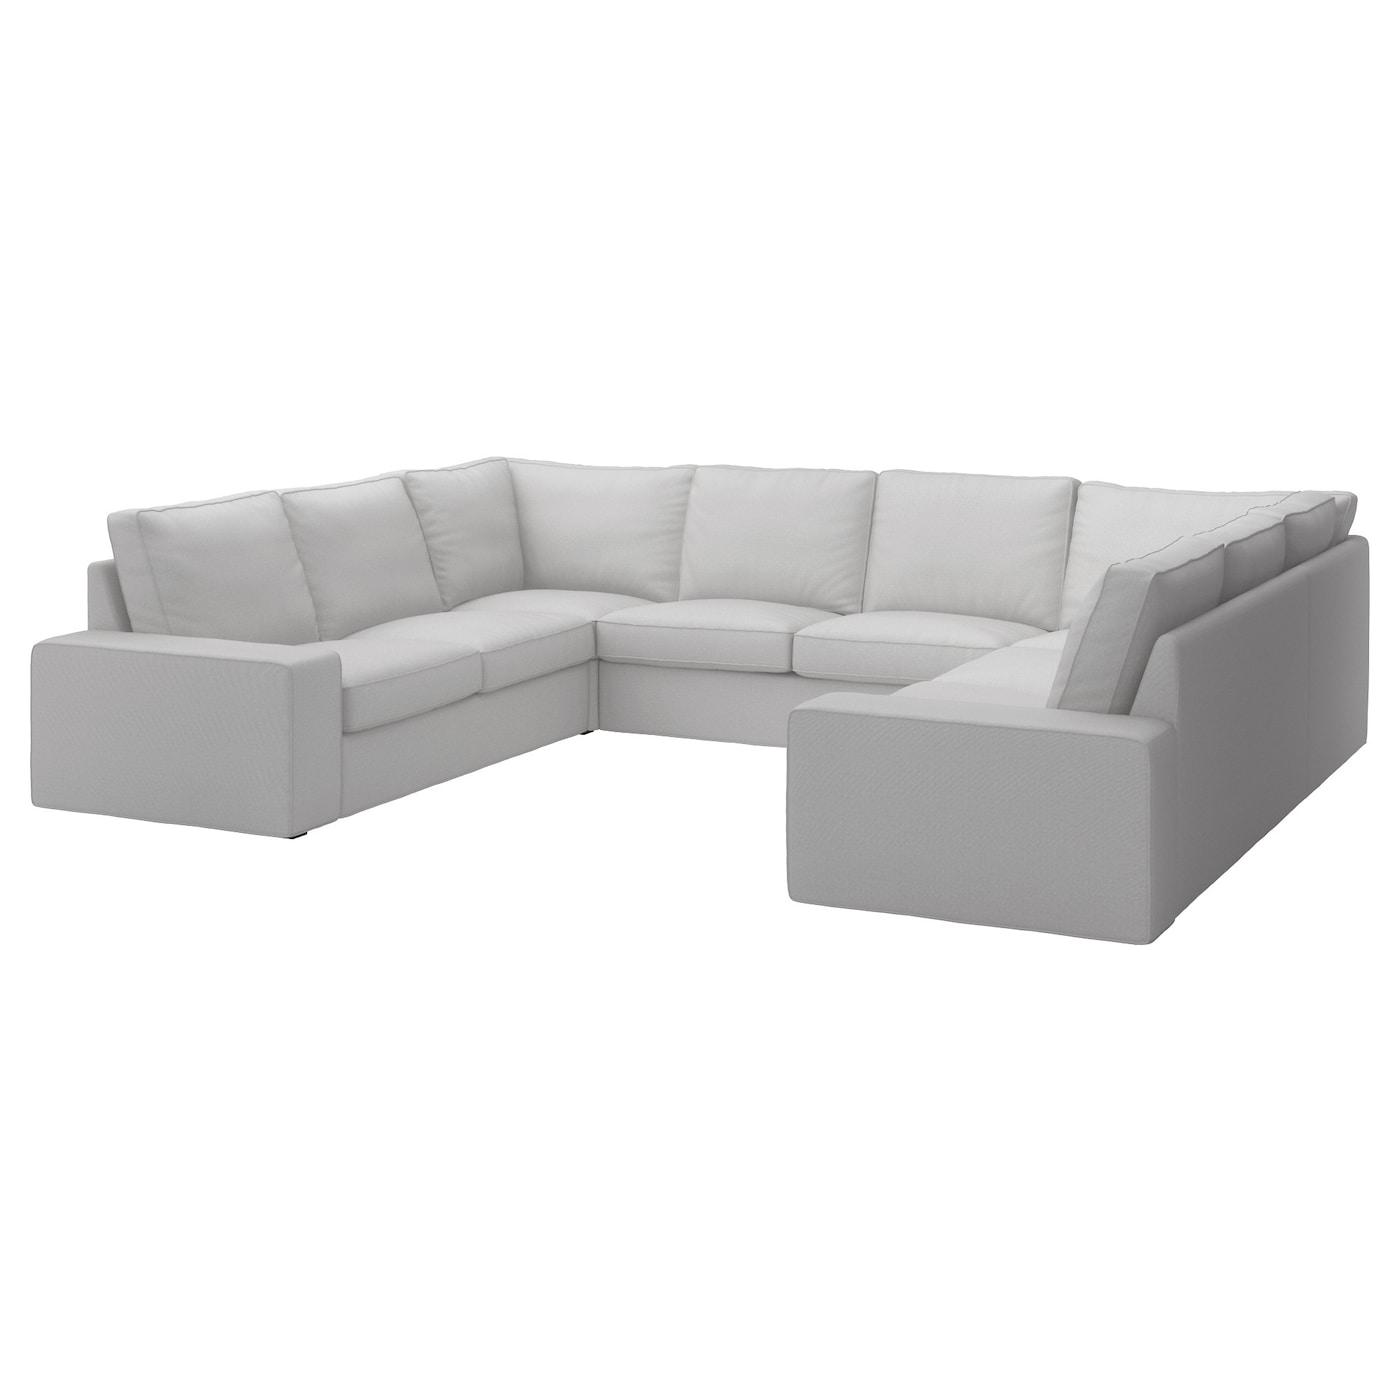 KIVIK U-shaped Sofa, 6 Seat Ramna Light Grey